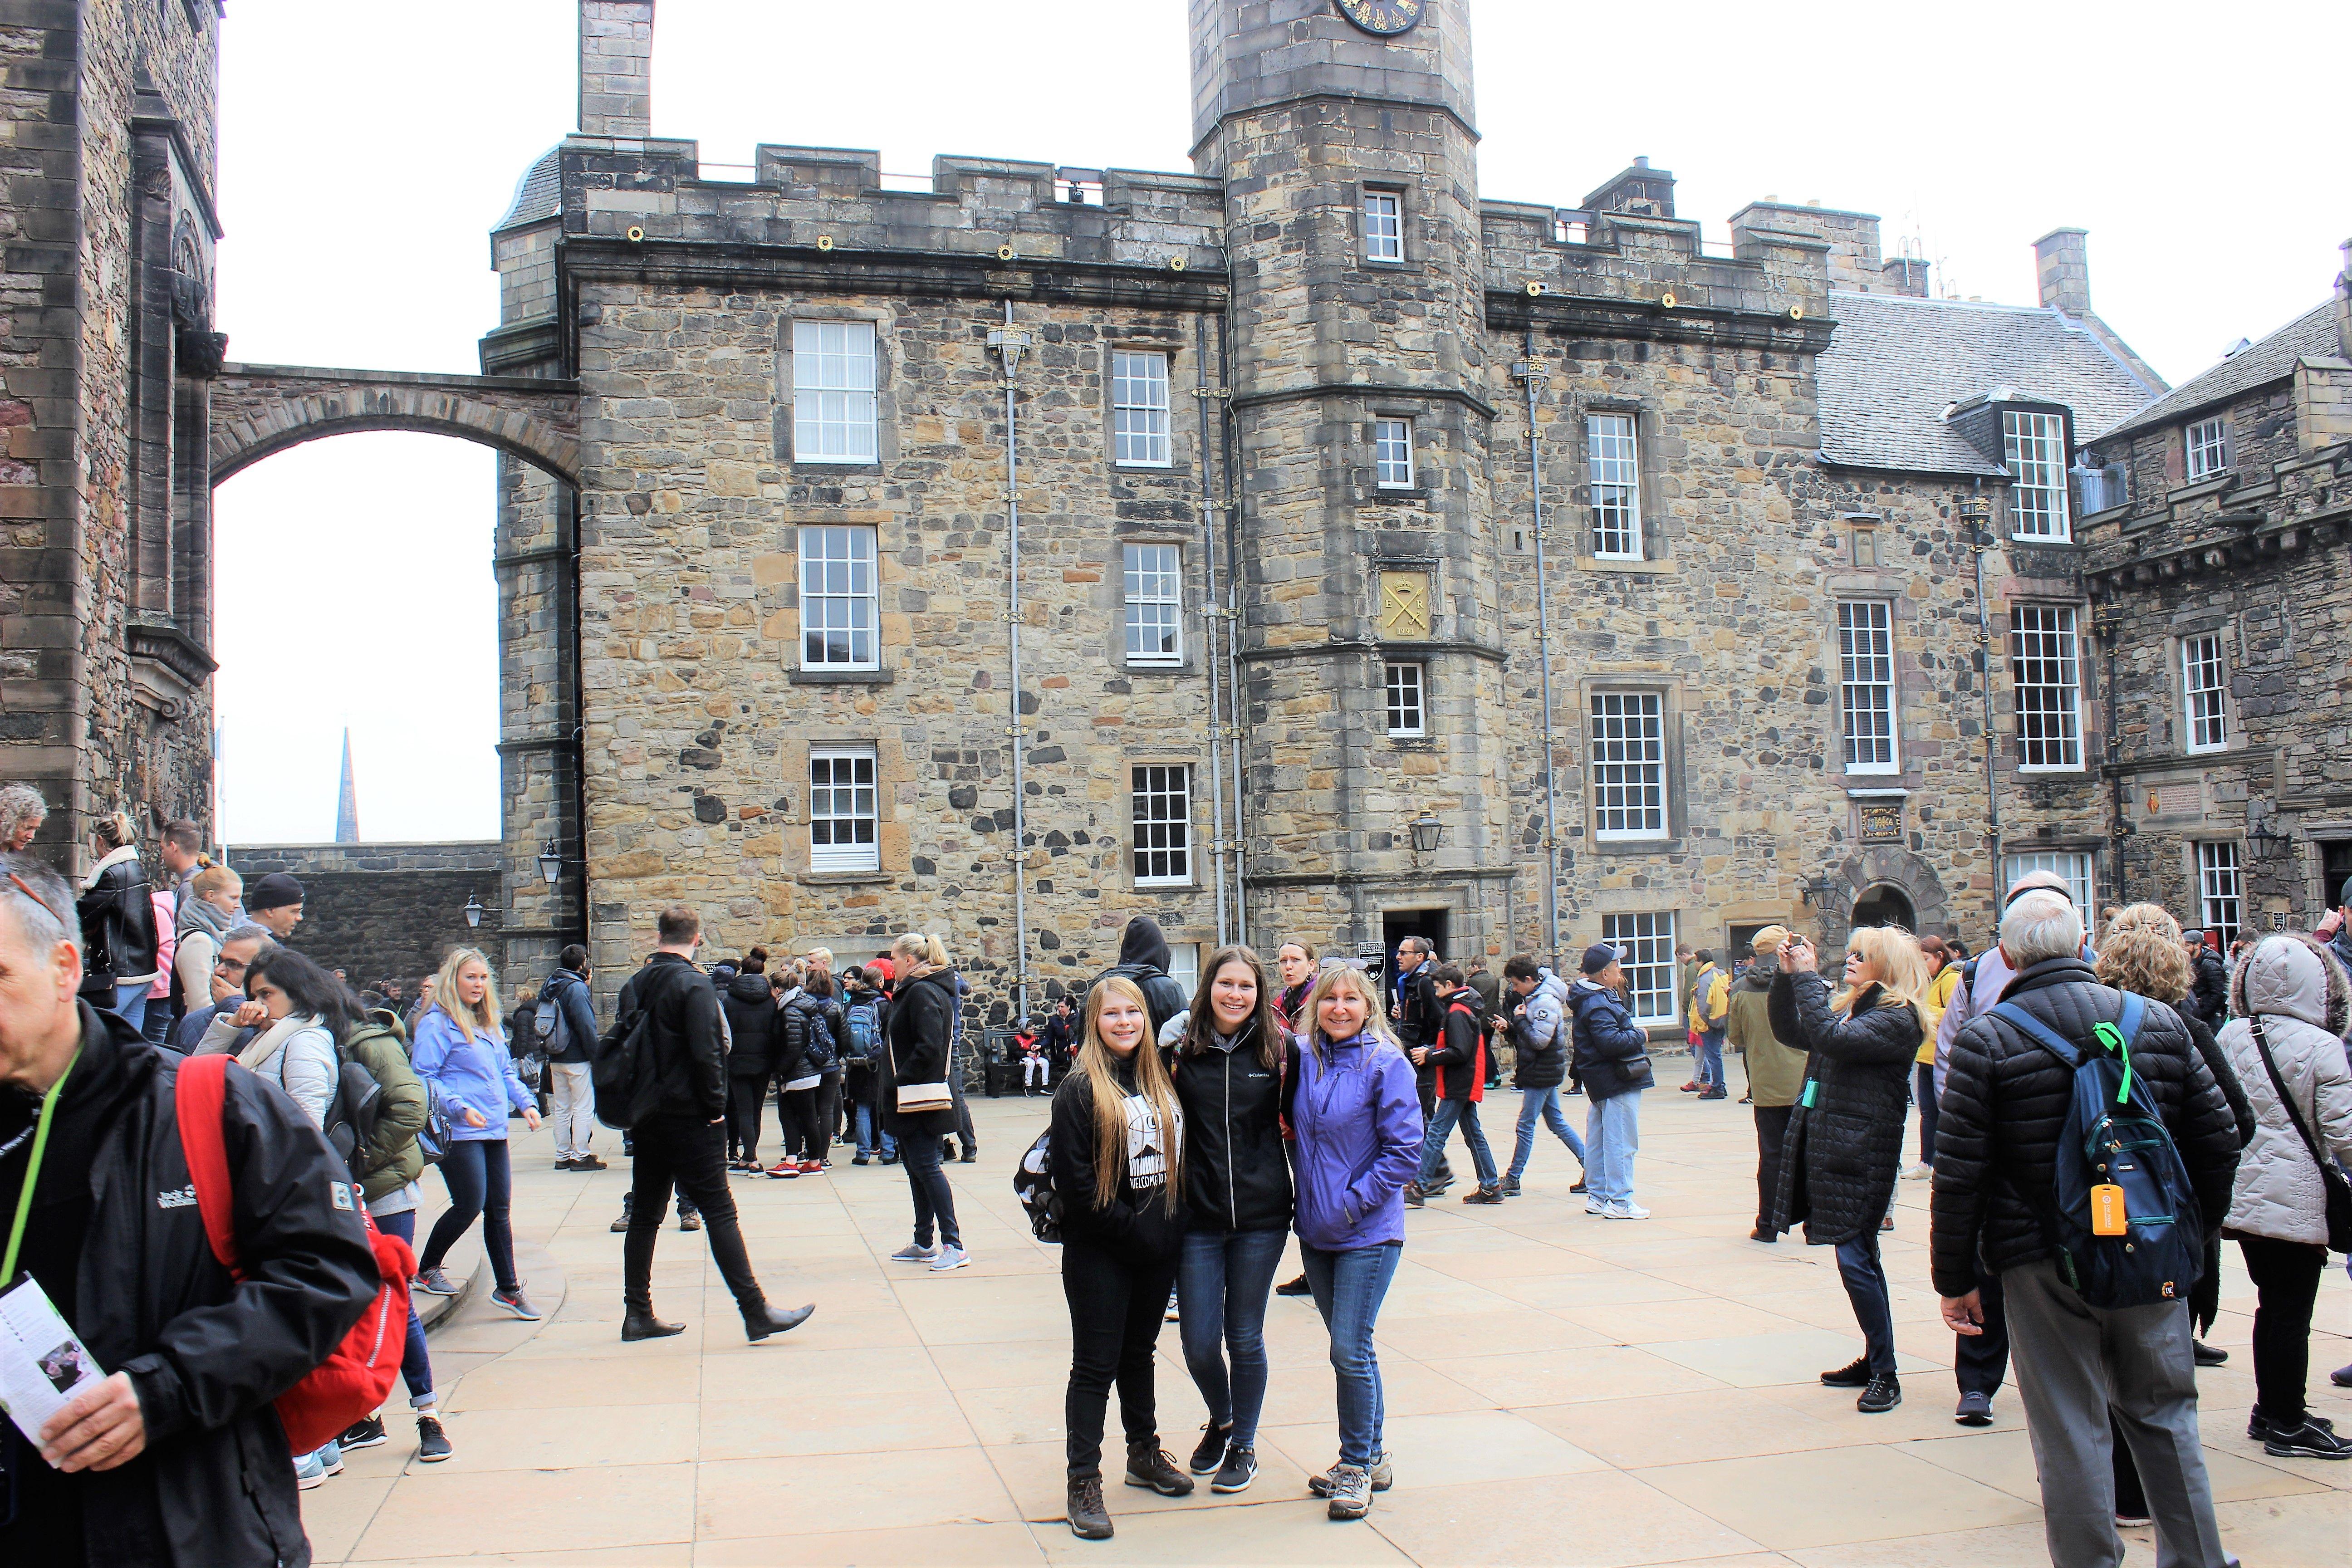 April 2019 Edinburgh Castle Courtyard Edinburgh Scotland